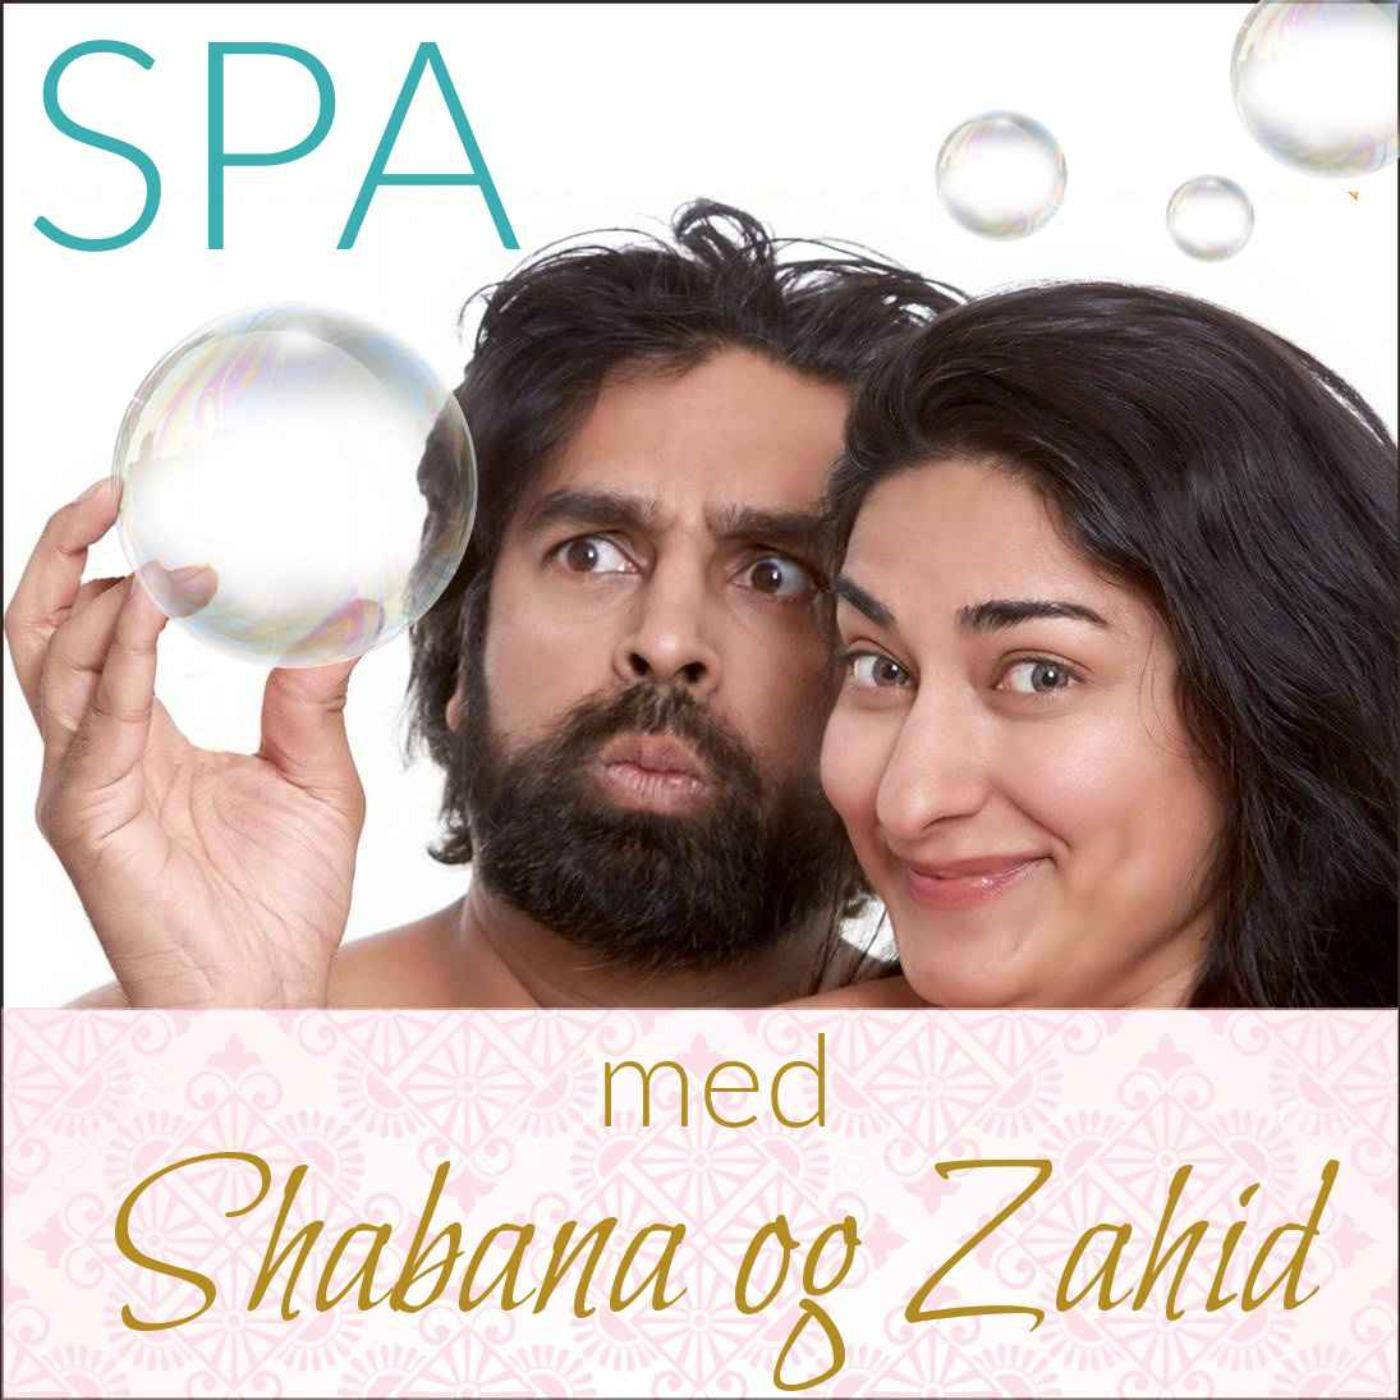 SPA -Med Shabana og Zahid